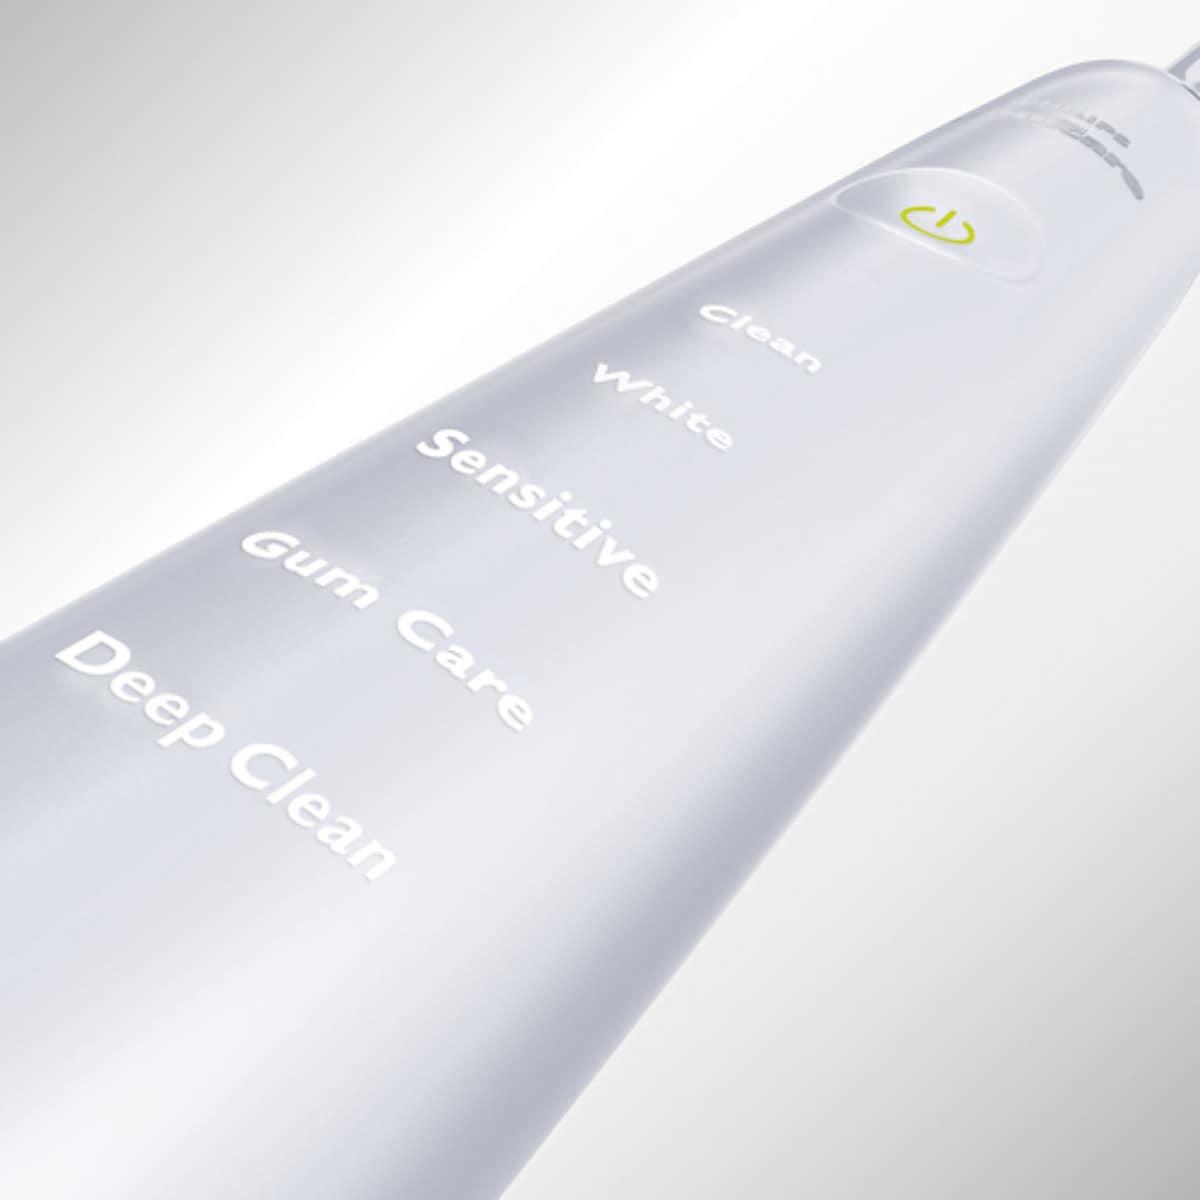 Philips Sonicare DiamondClean HX9331/32 elektrisk tannbørste